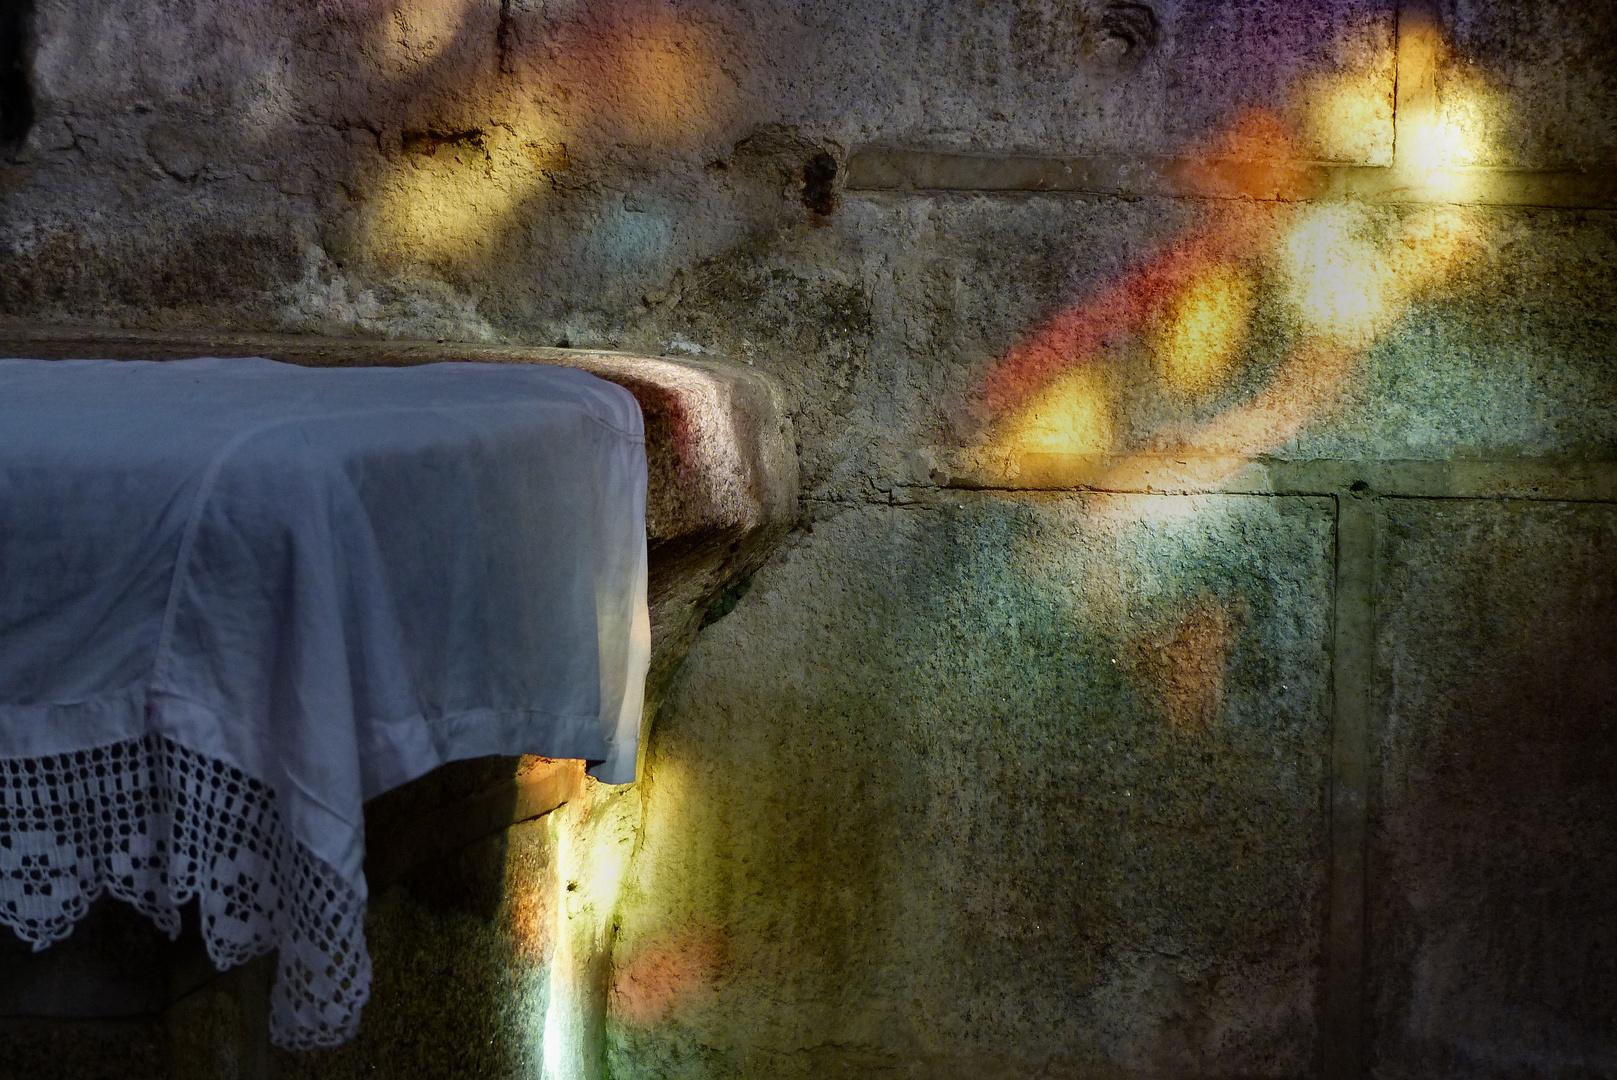 Farbenspiel in der Kirche Saint Ronan, Locronan